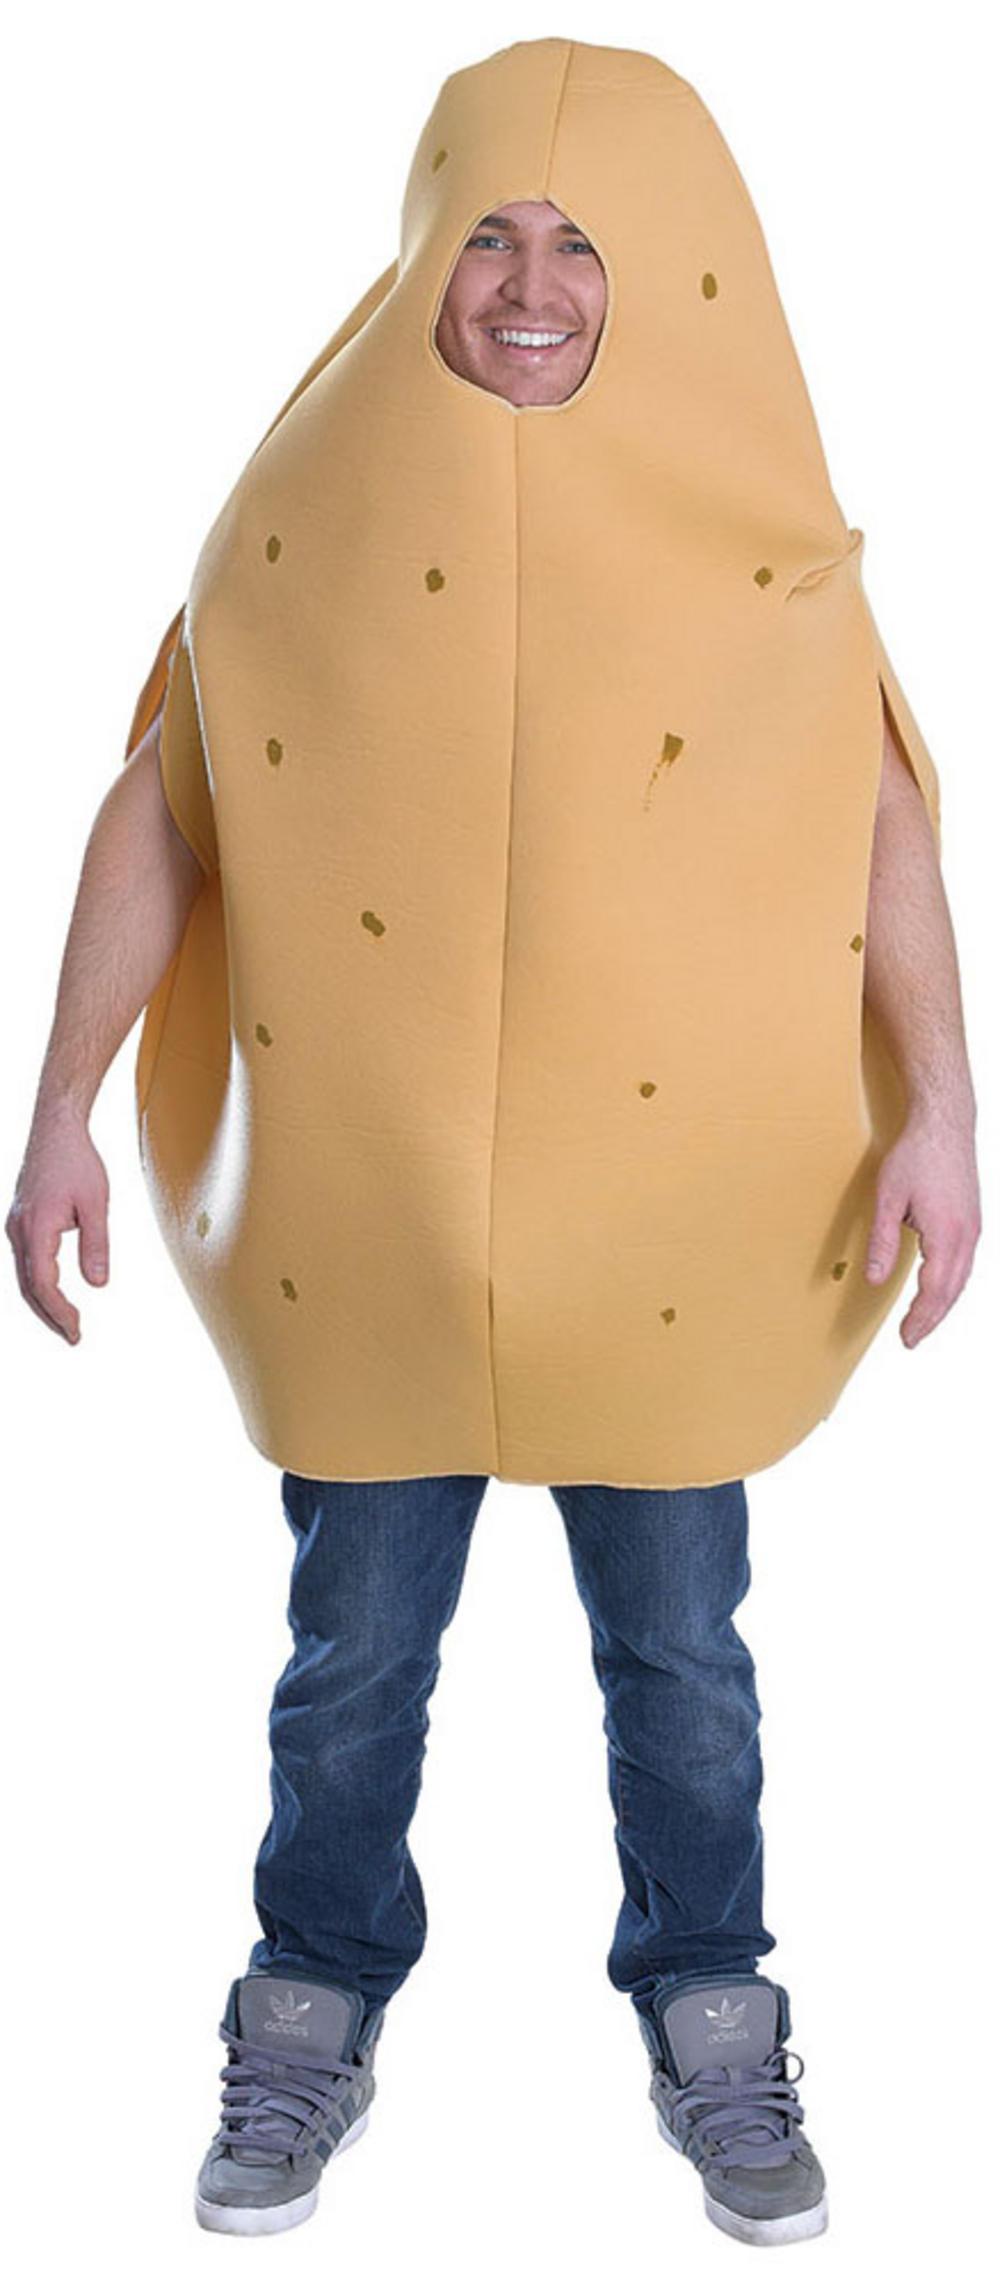 Potato Adults Costume